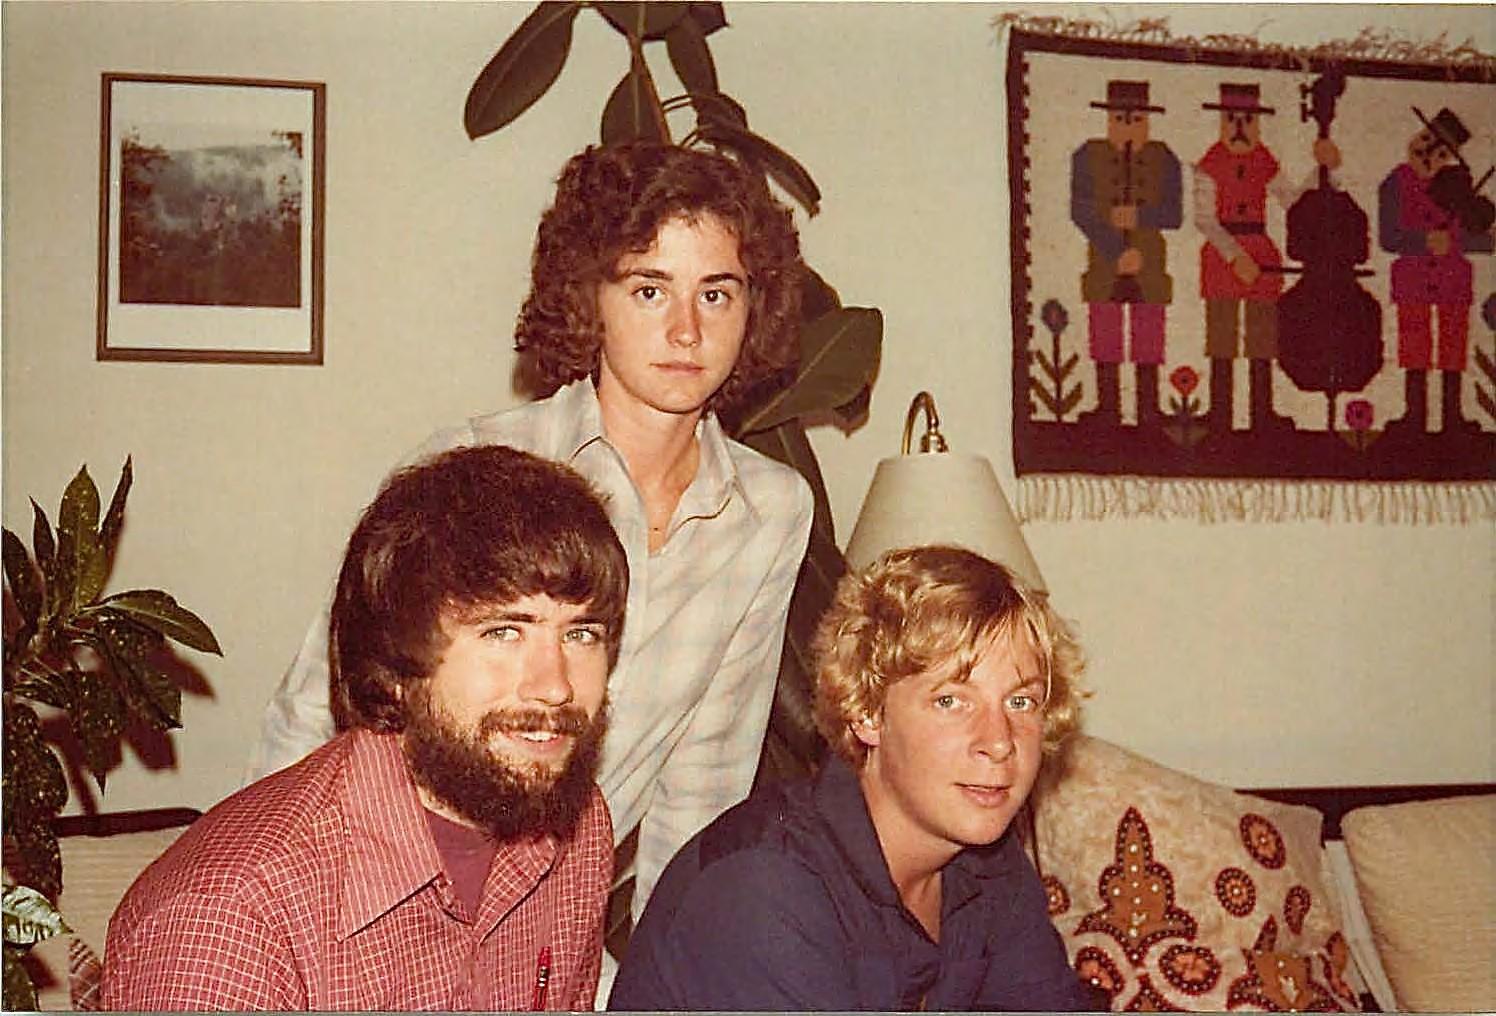 John, Ann Wagner, John Ackerman  1978 San Fancisco, CA